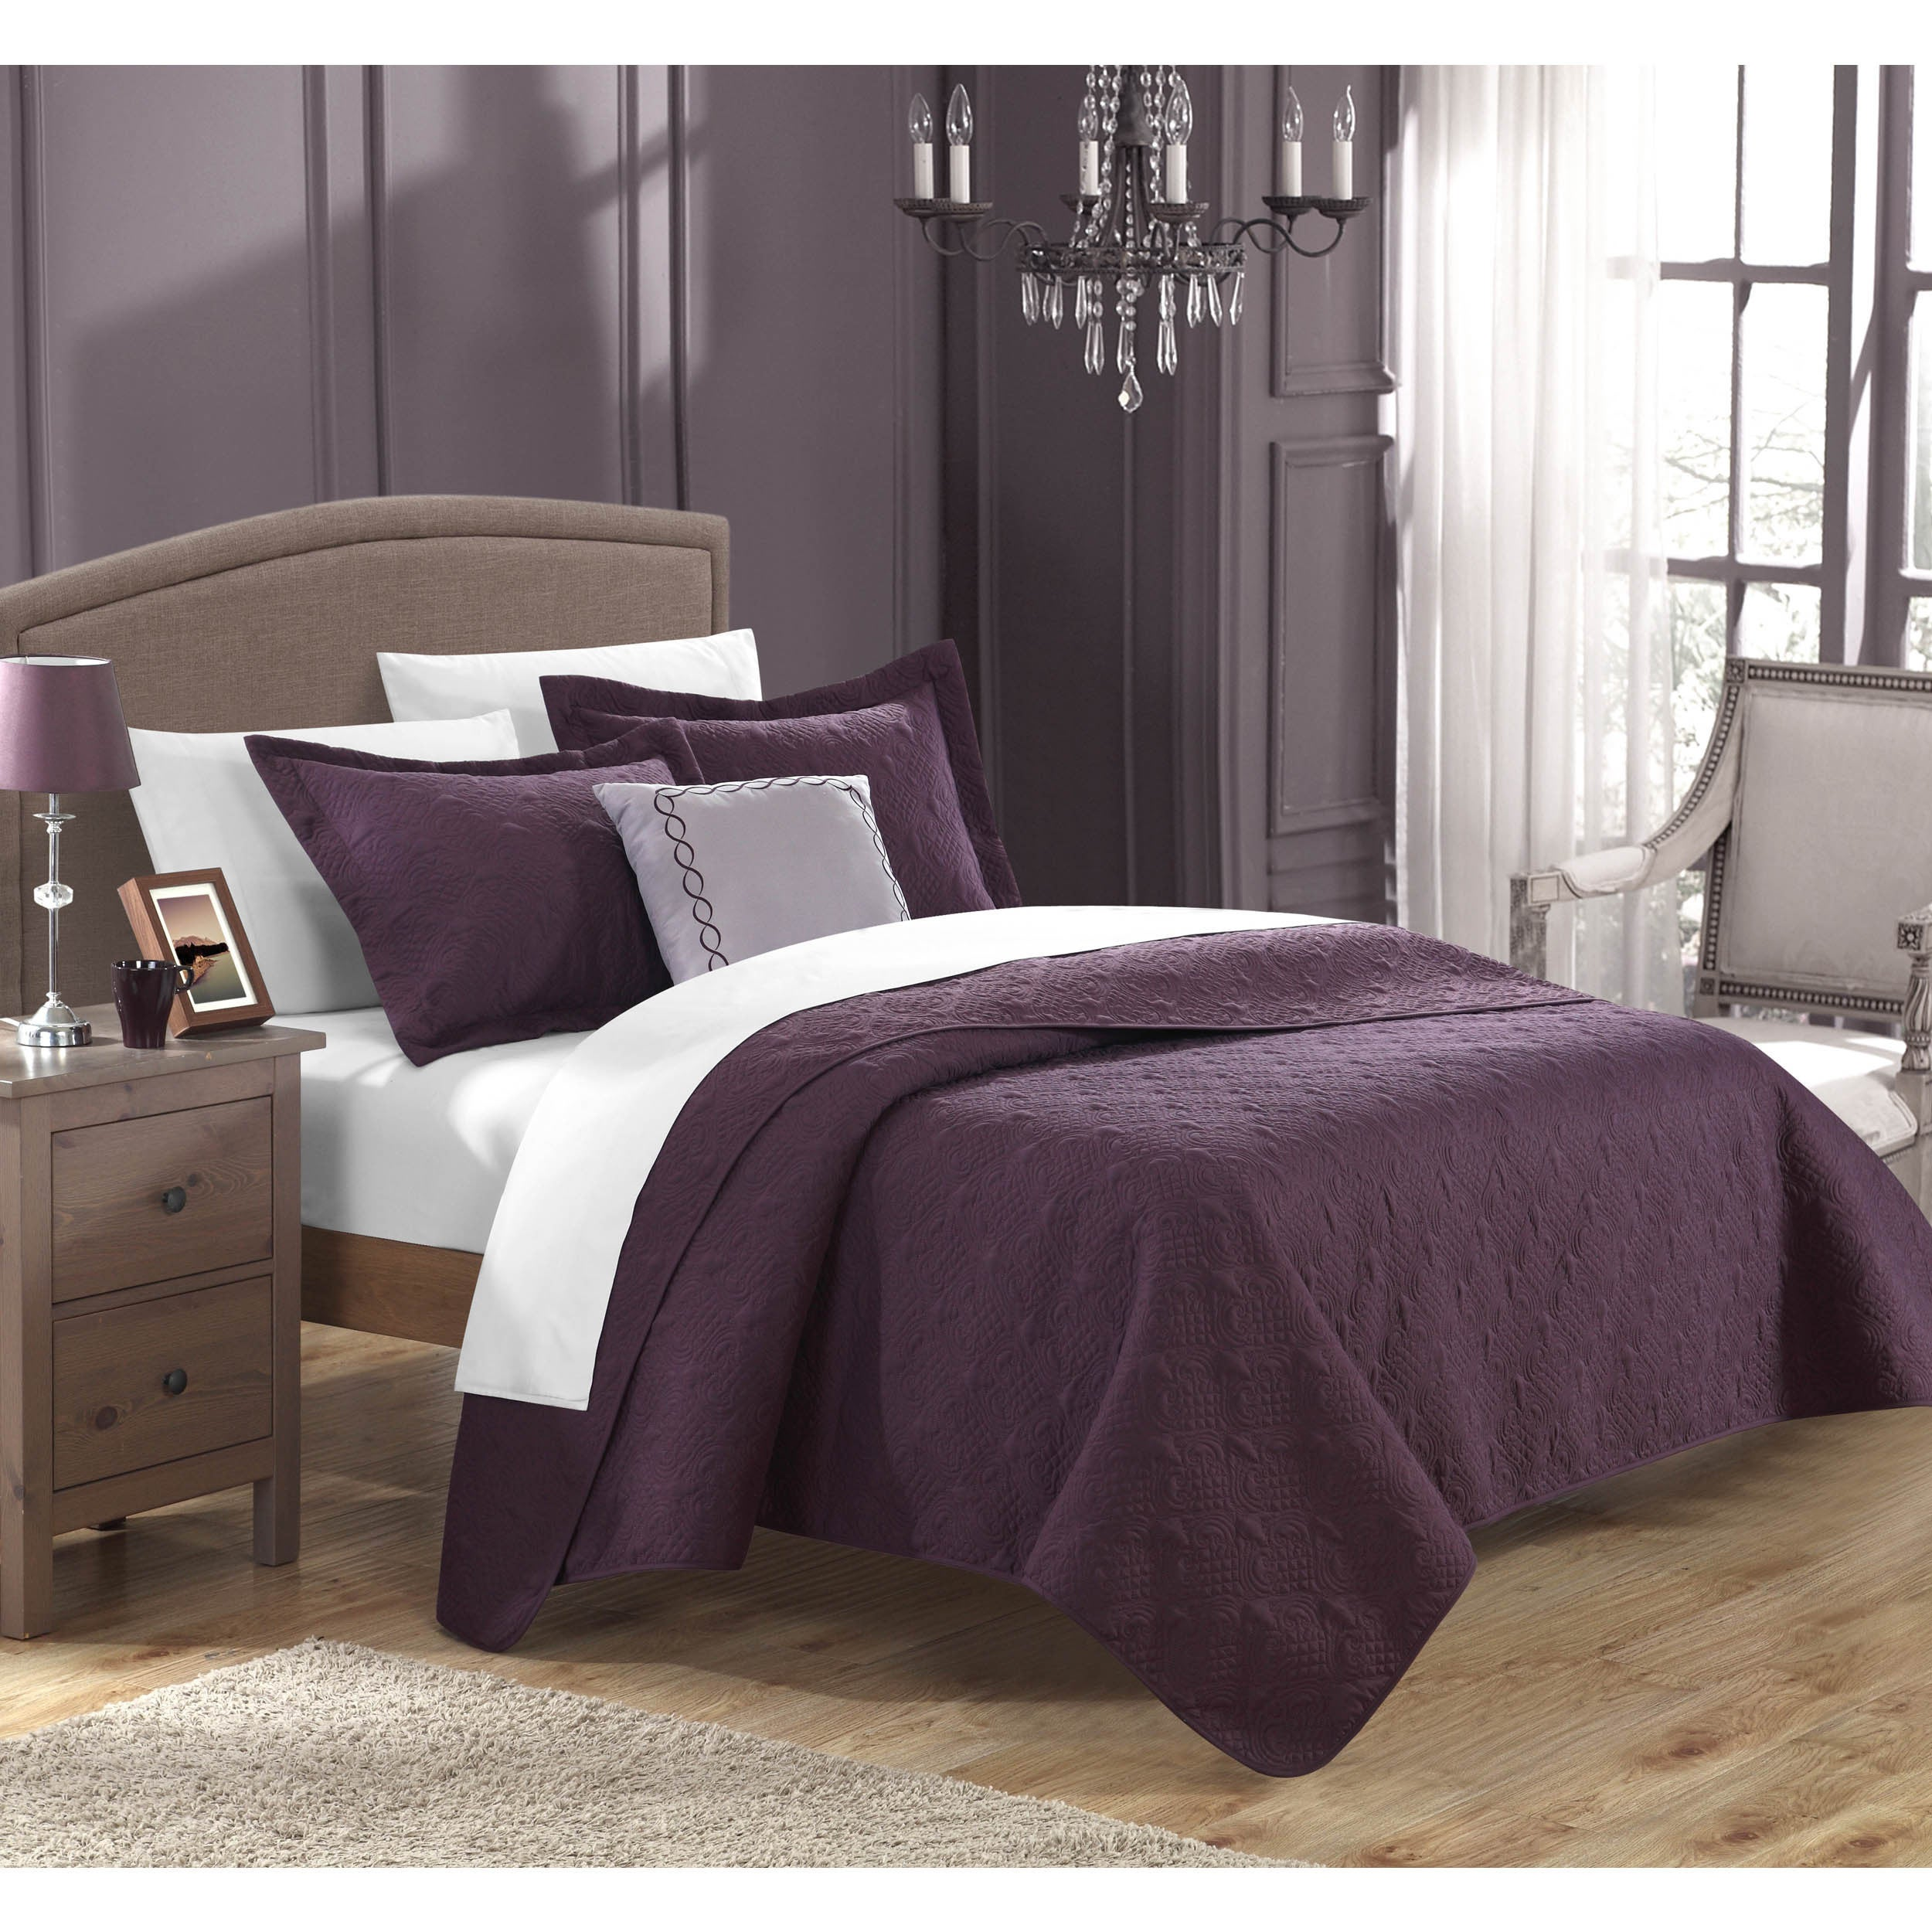 bedding quilt colored crib sets plum museosdemolina multi colorful